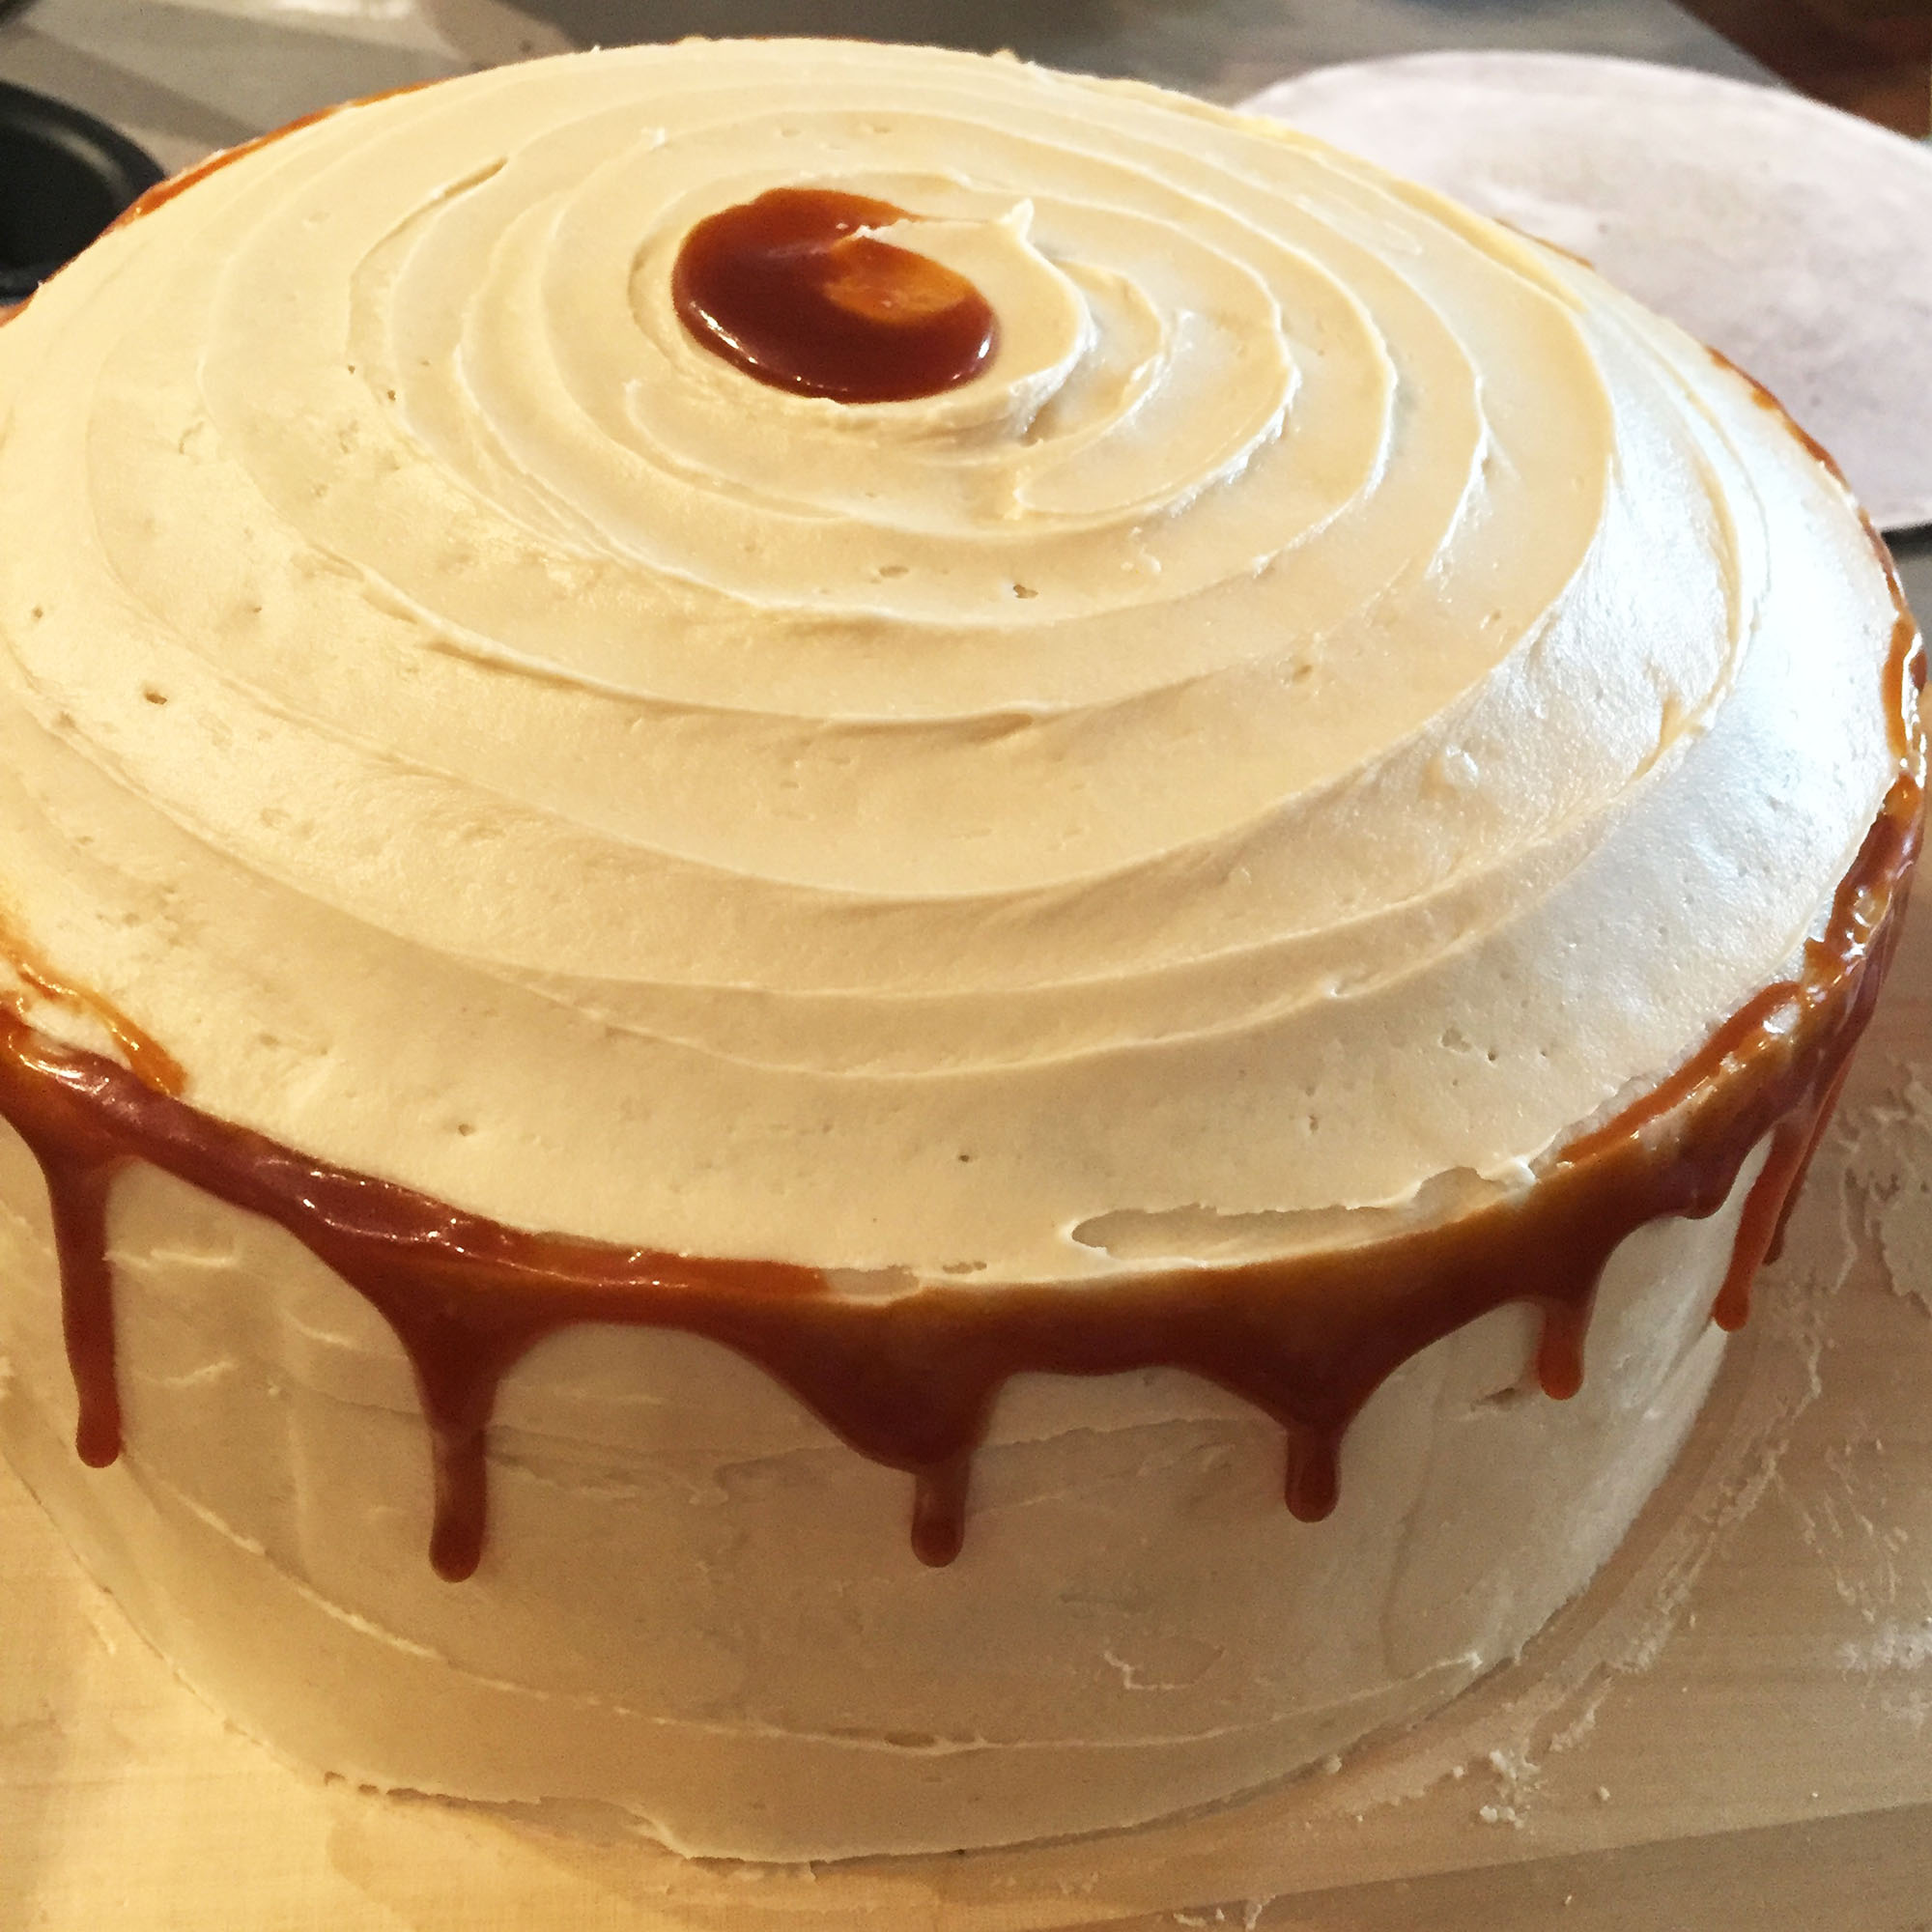 Caramel Chocolate Cake by Amelie